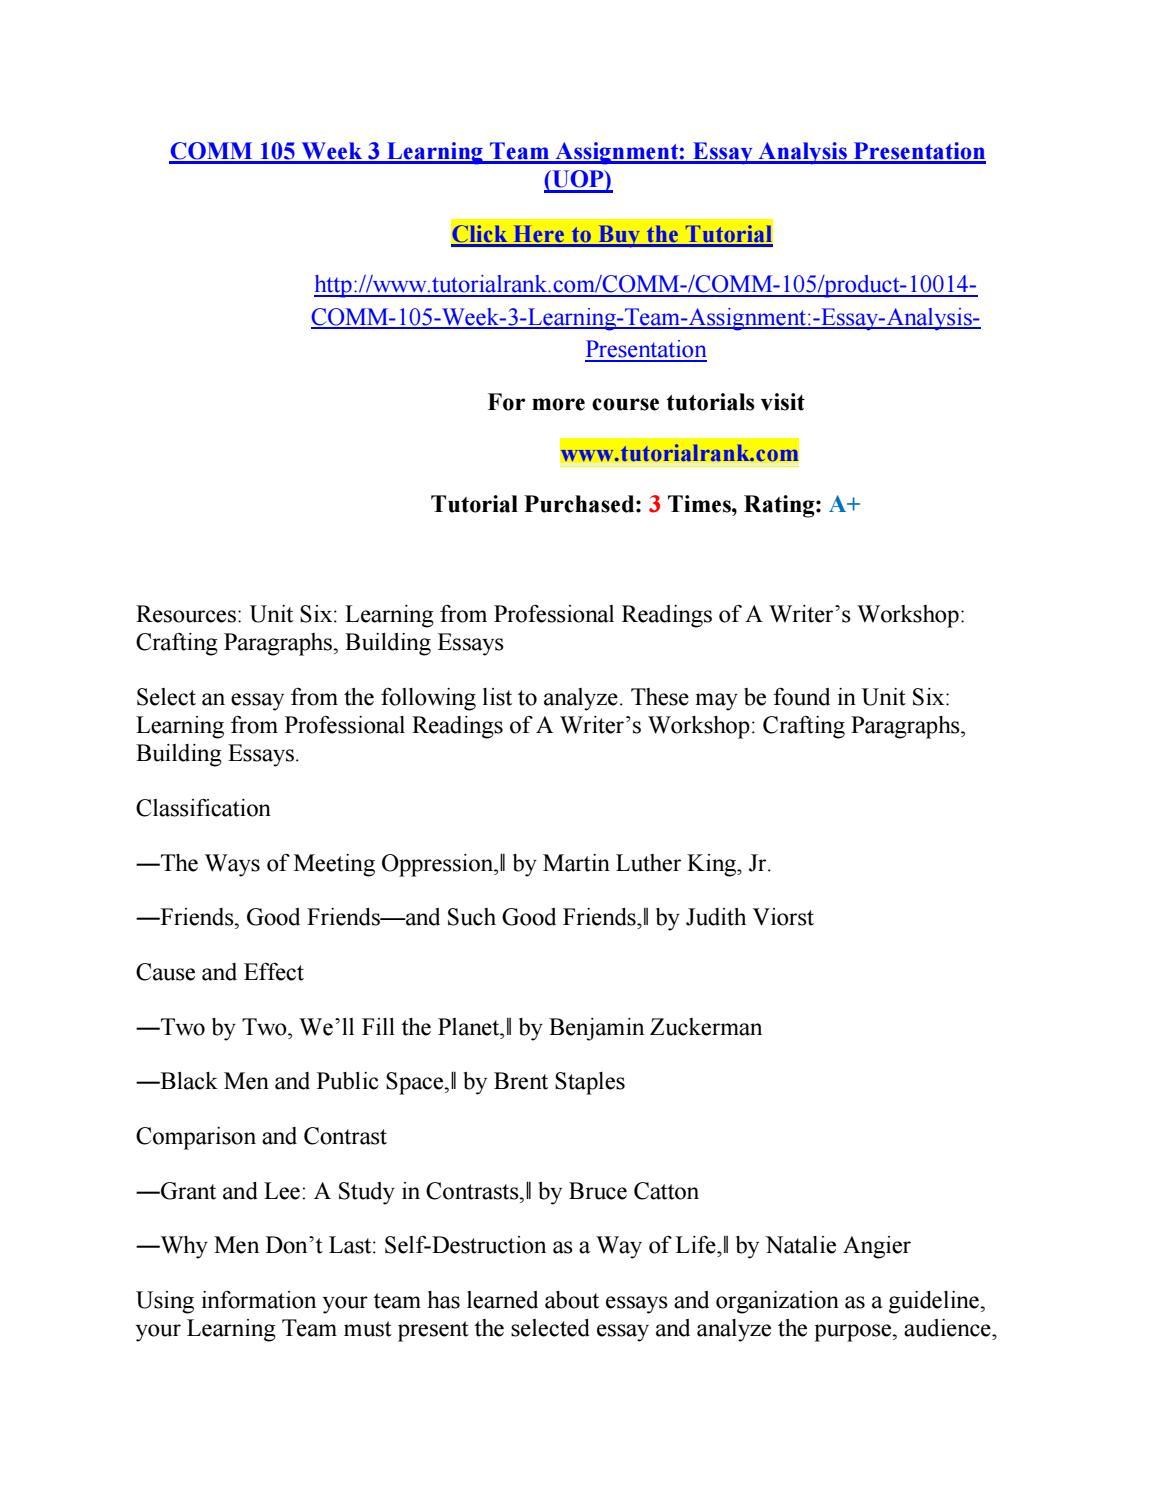 Presentation online training services international students